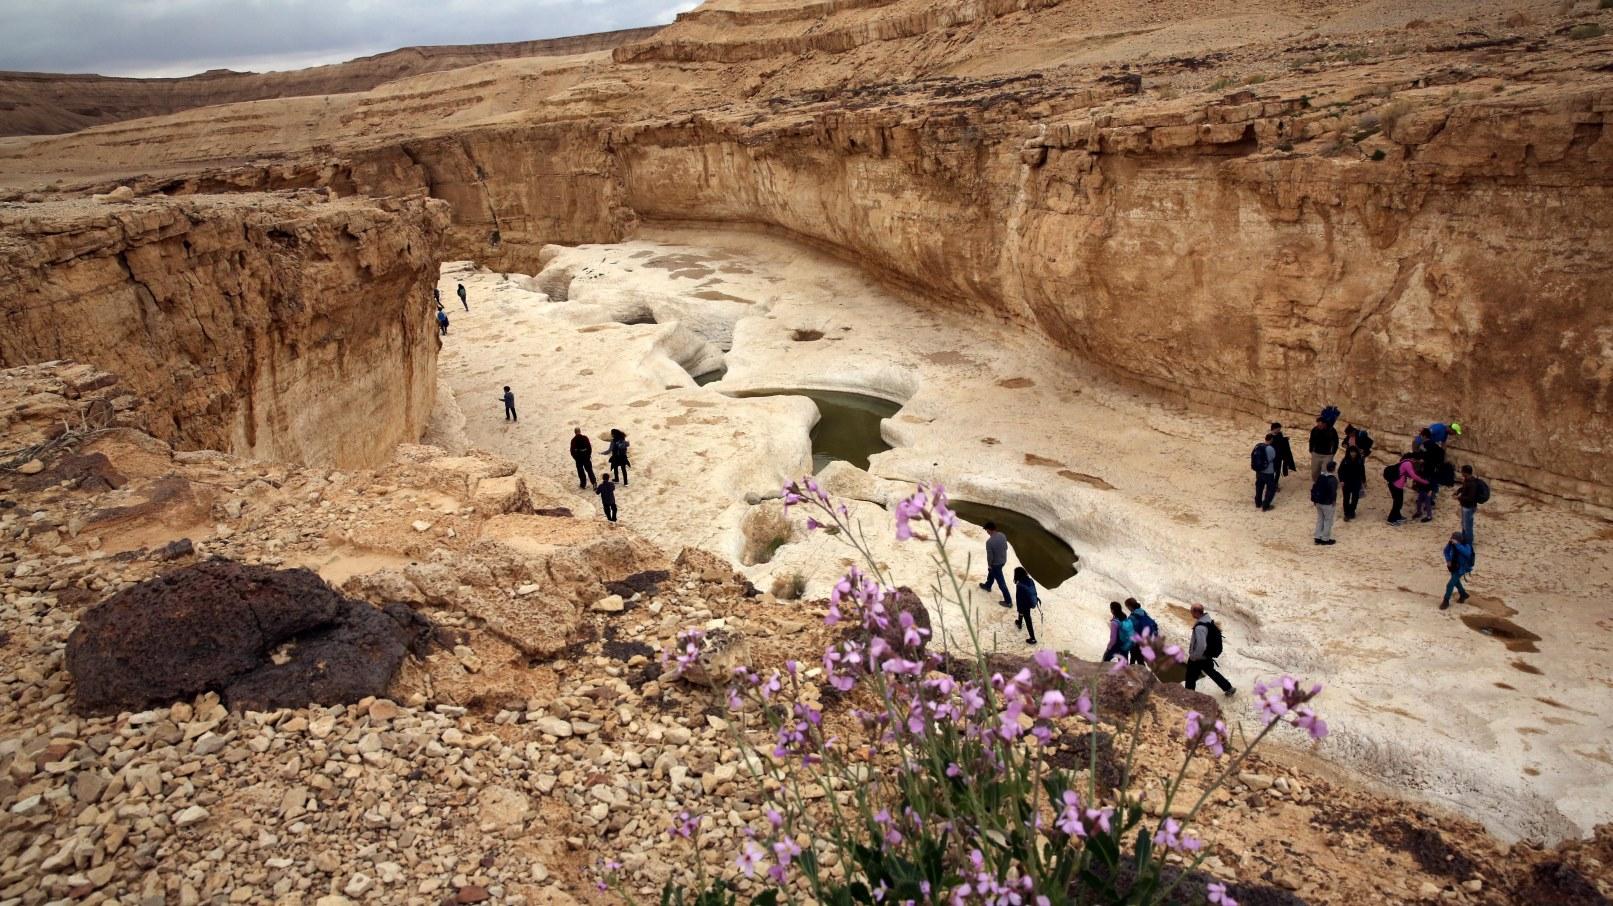 Israelis hiking in the Judean Desert. Photo by Yossi Zamir/FLASH90